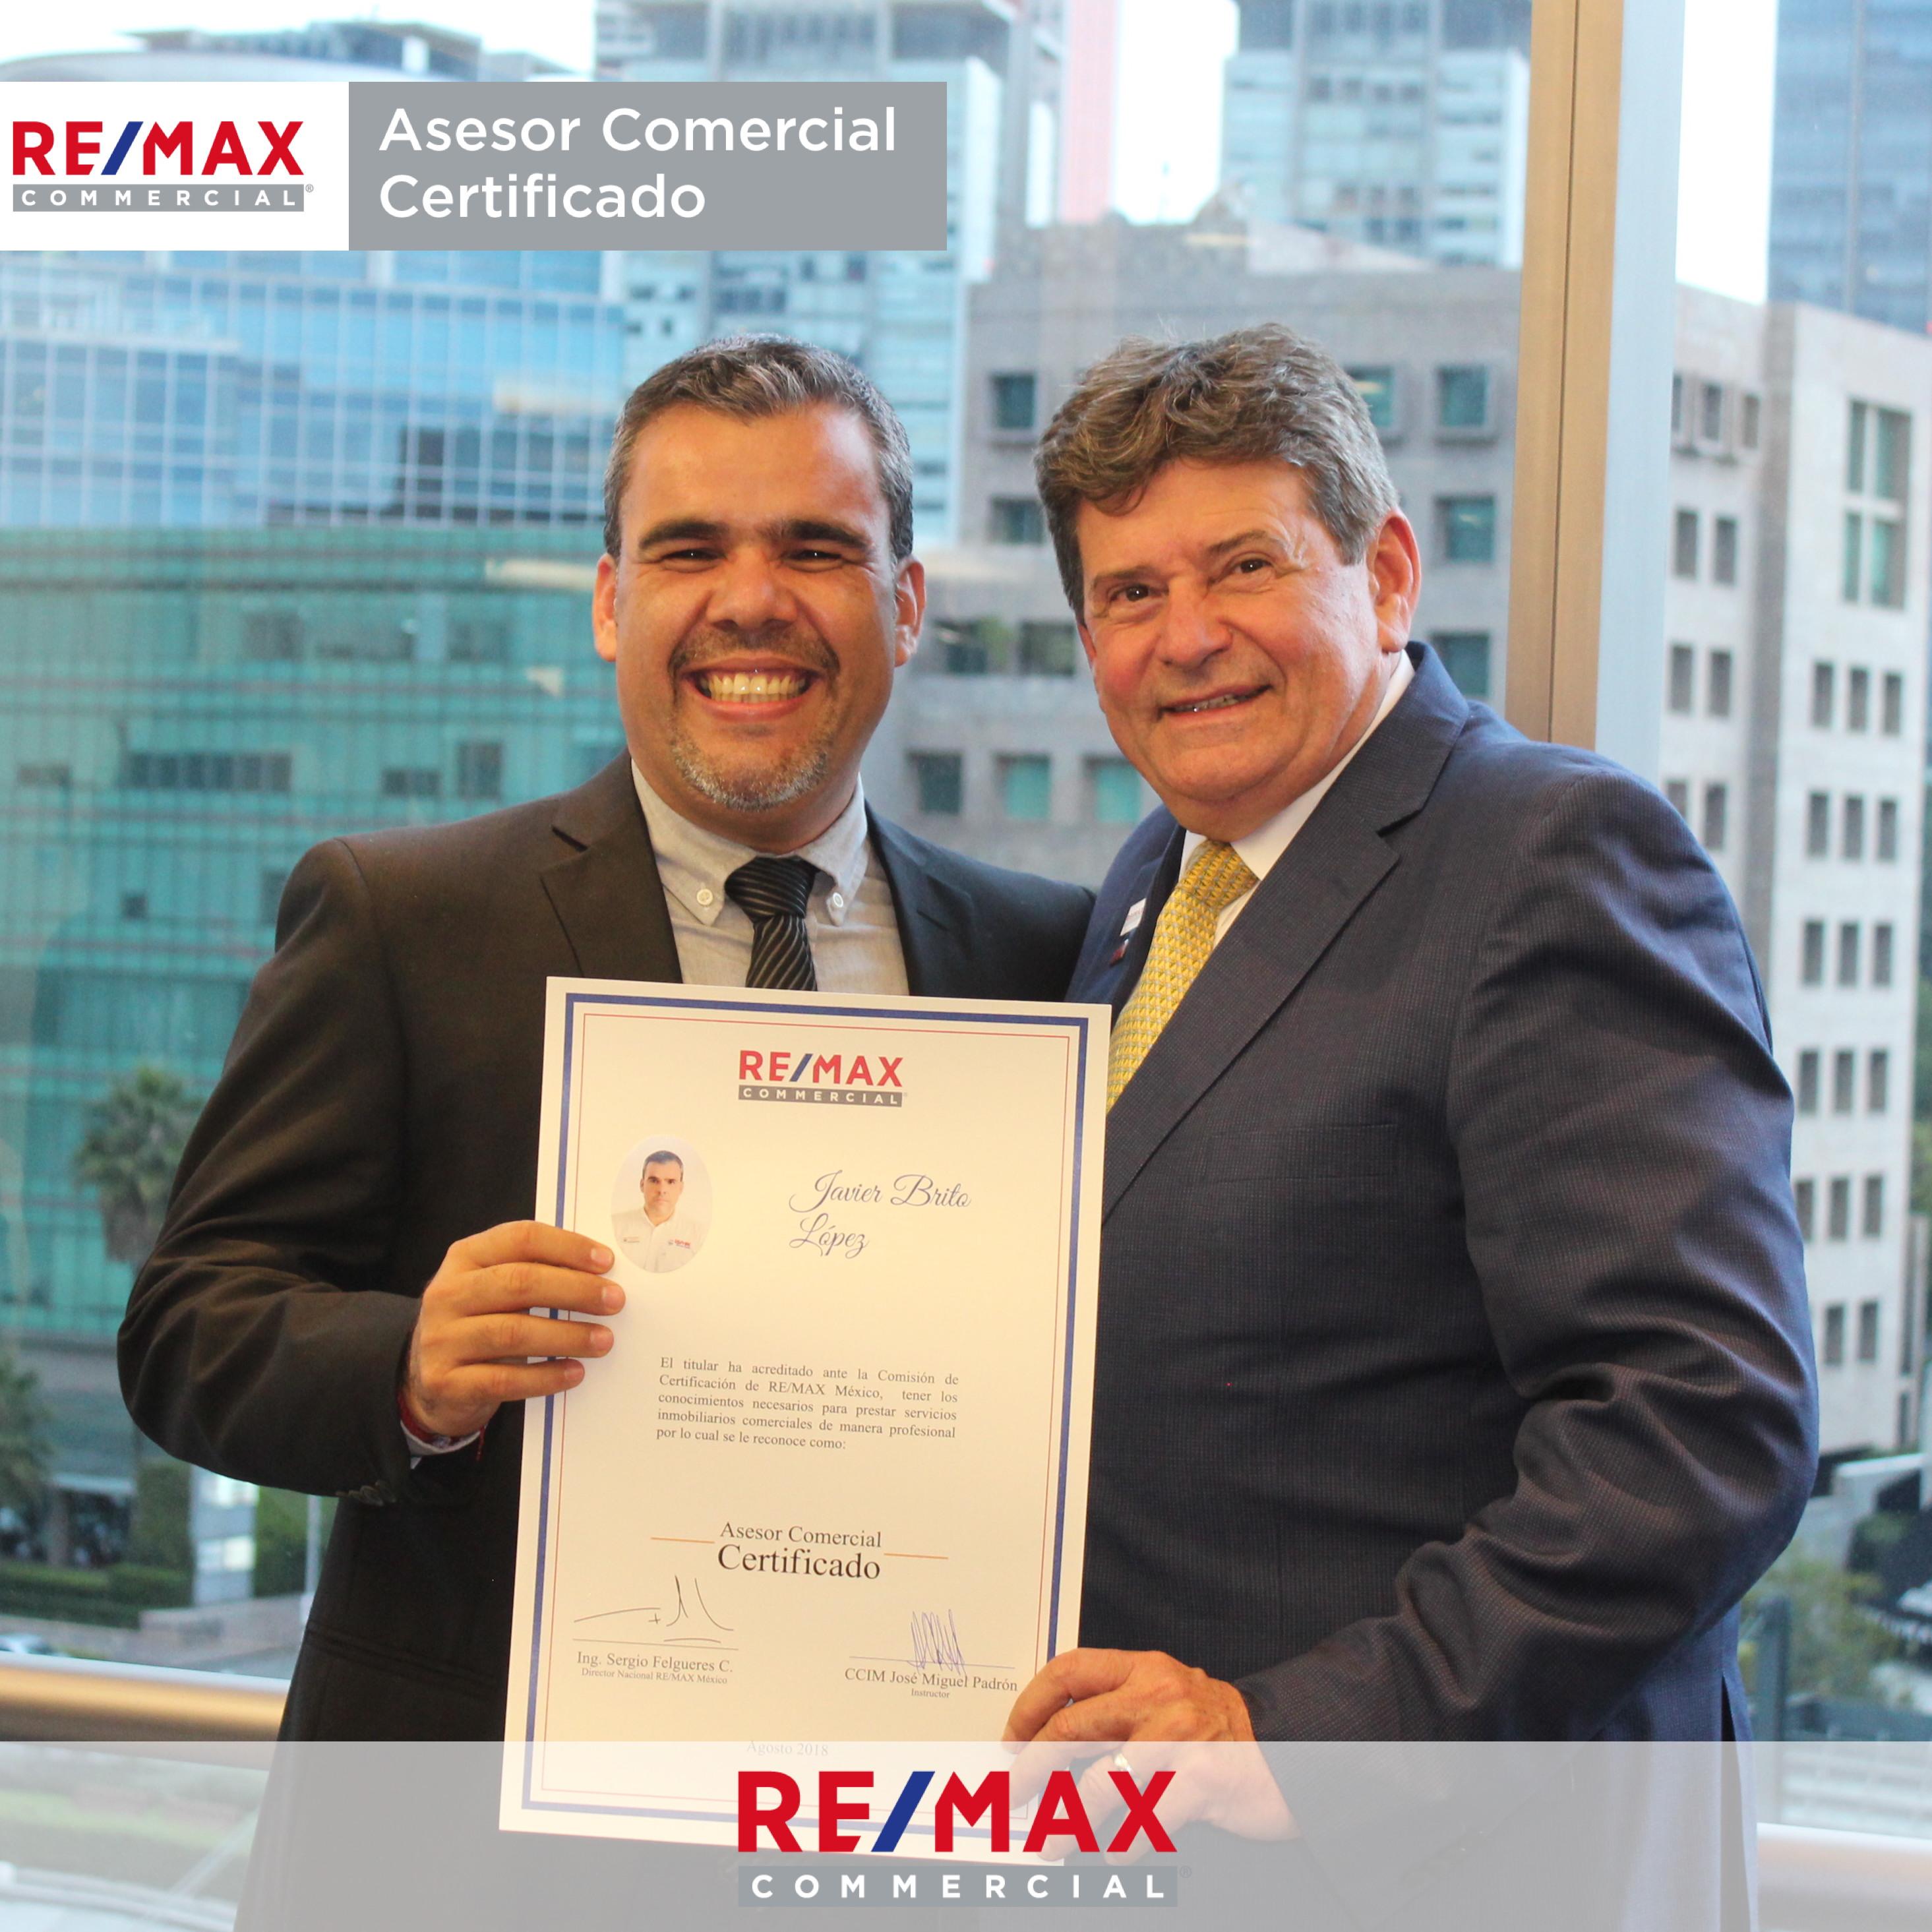 15_Certificacion_comercial_comprar_rentar_vender_casa_departamento_franquicias_inmobiliarias_REMAX_mexico_propiedades_comerciales_terrenos_bodegas